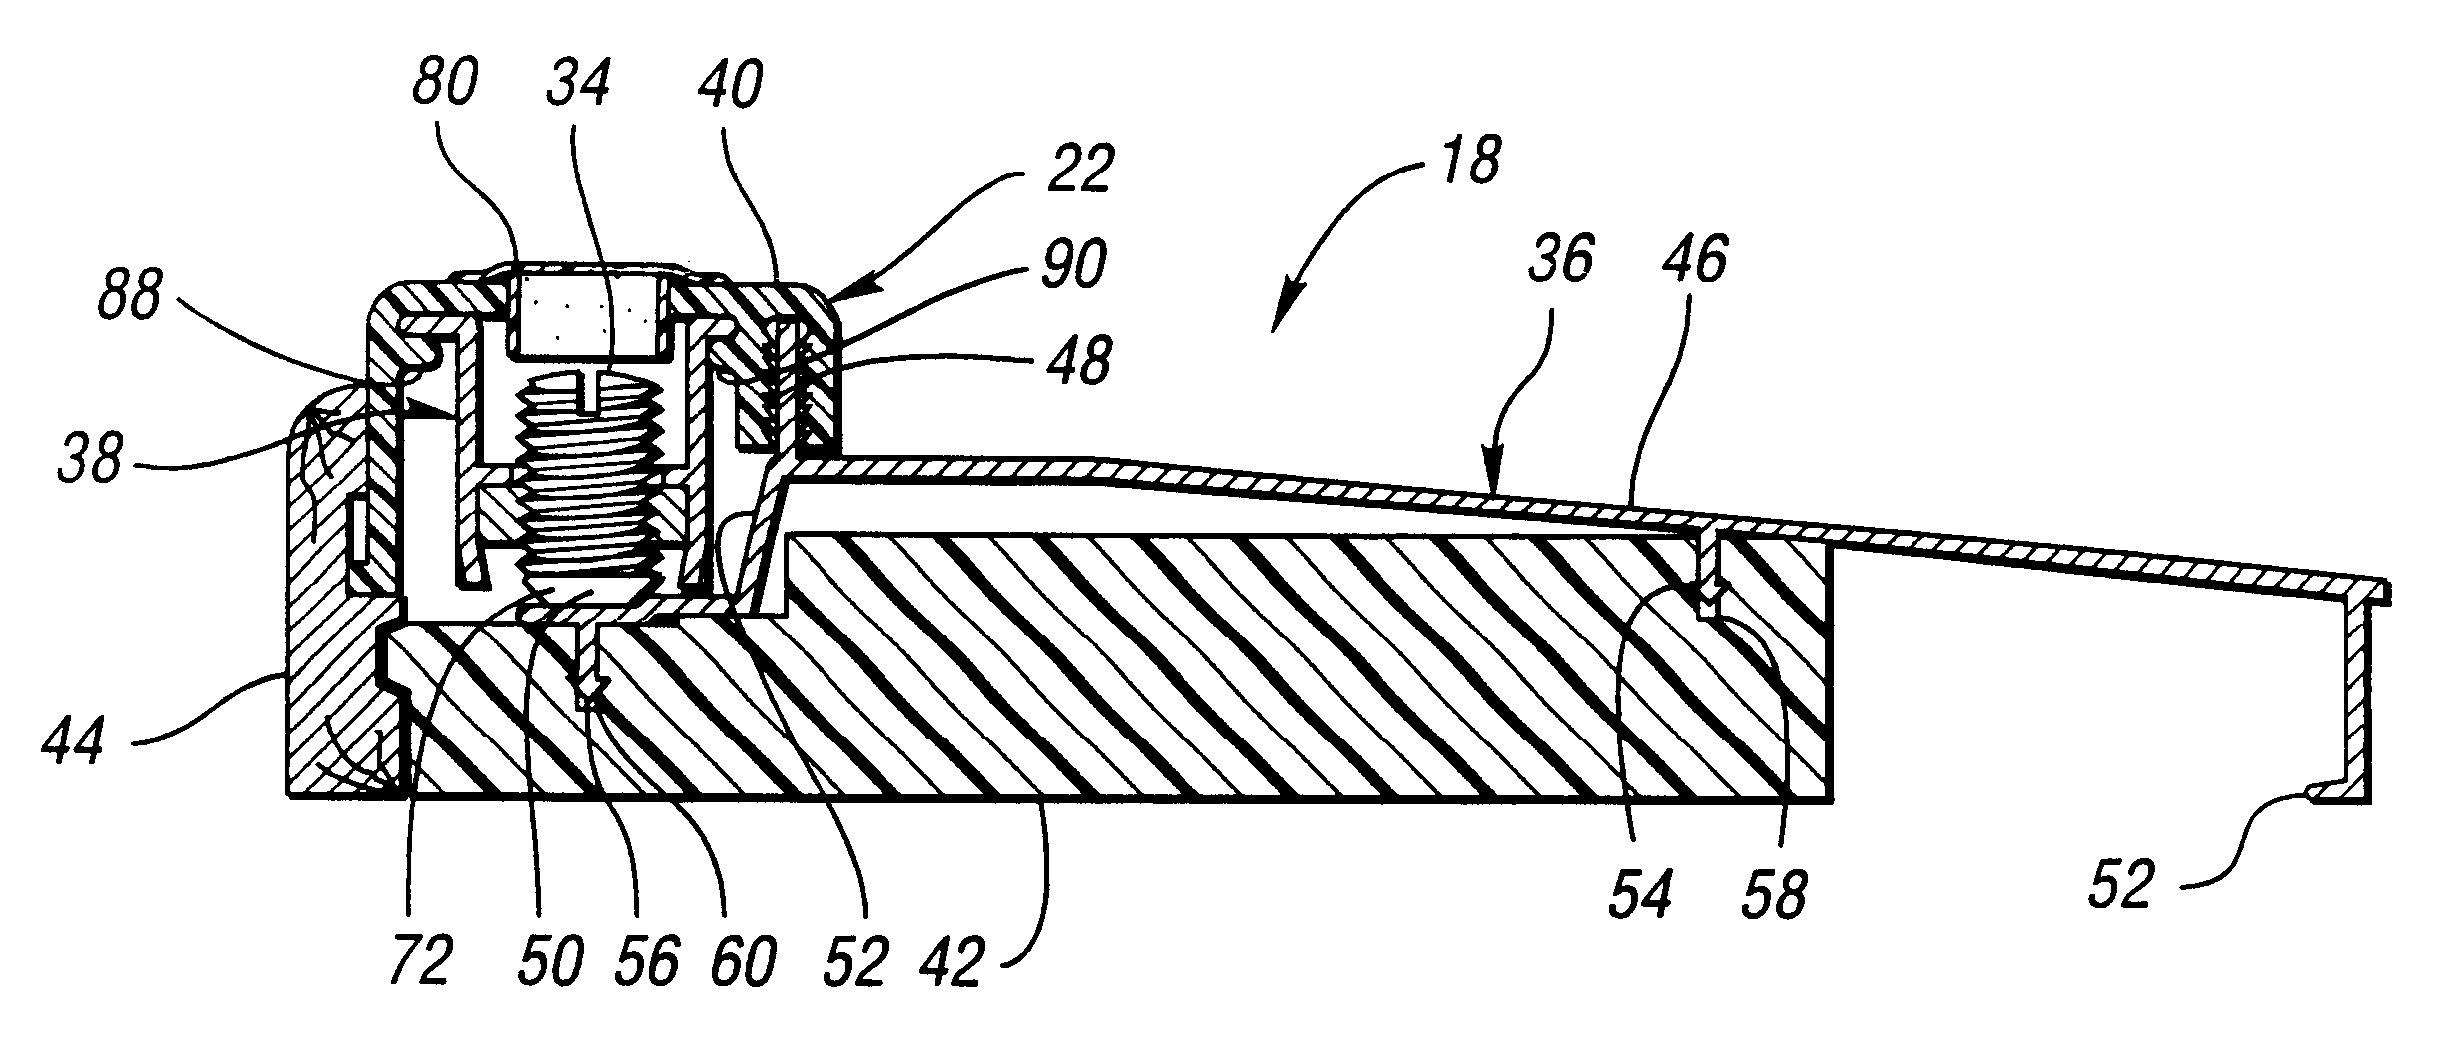 Patent Us6345477 Door Sill Assembly Having Adjustable